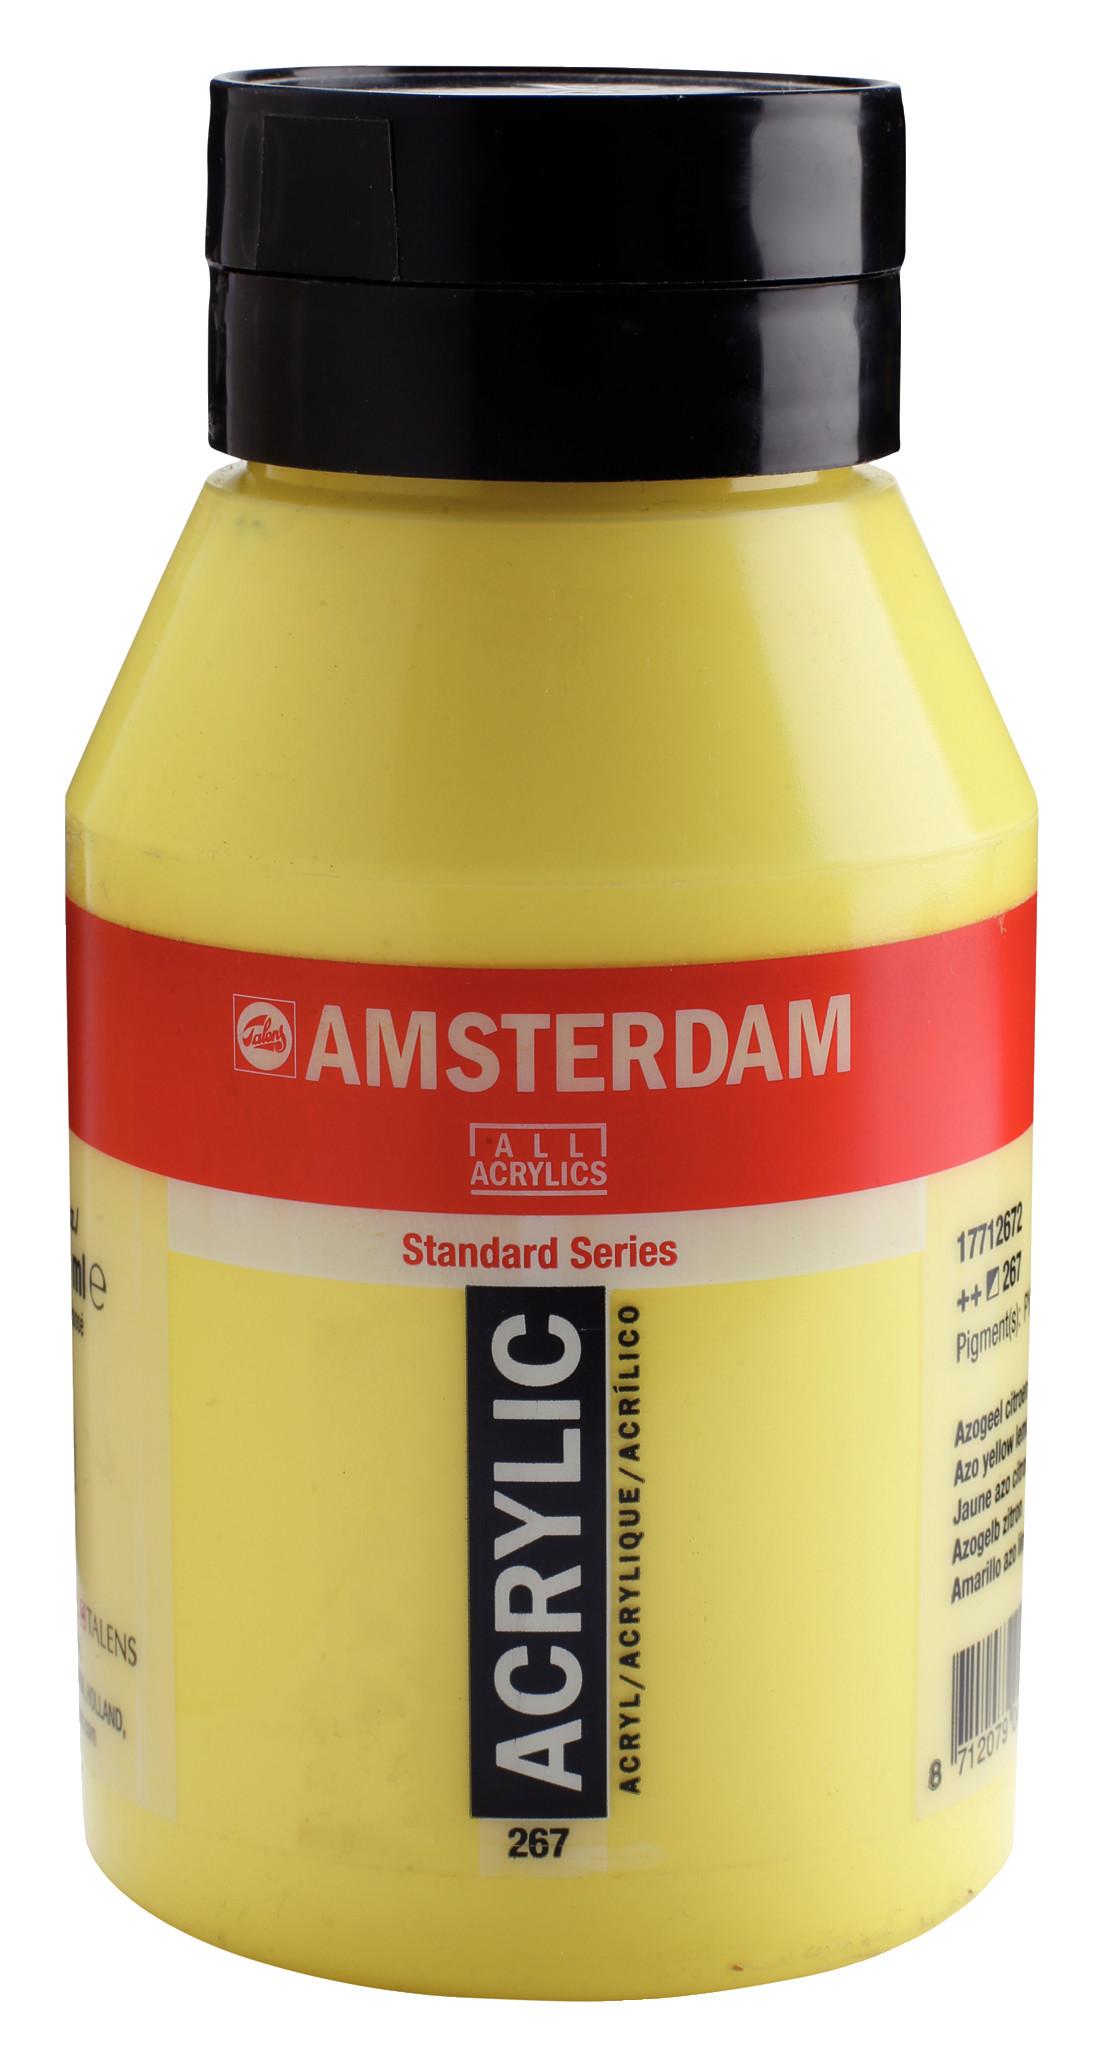 Amsterdam Standard Series Acrylic Jar 1000 ml Azo yellow lemon 267